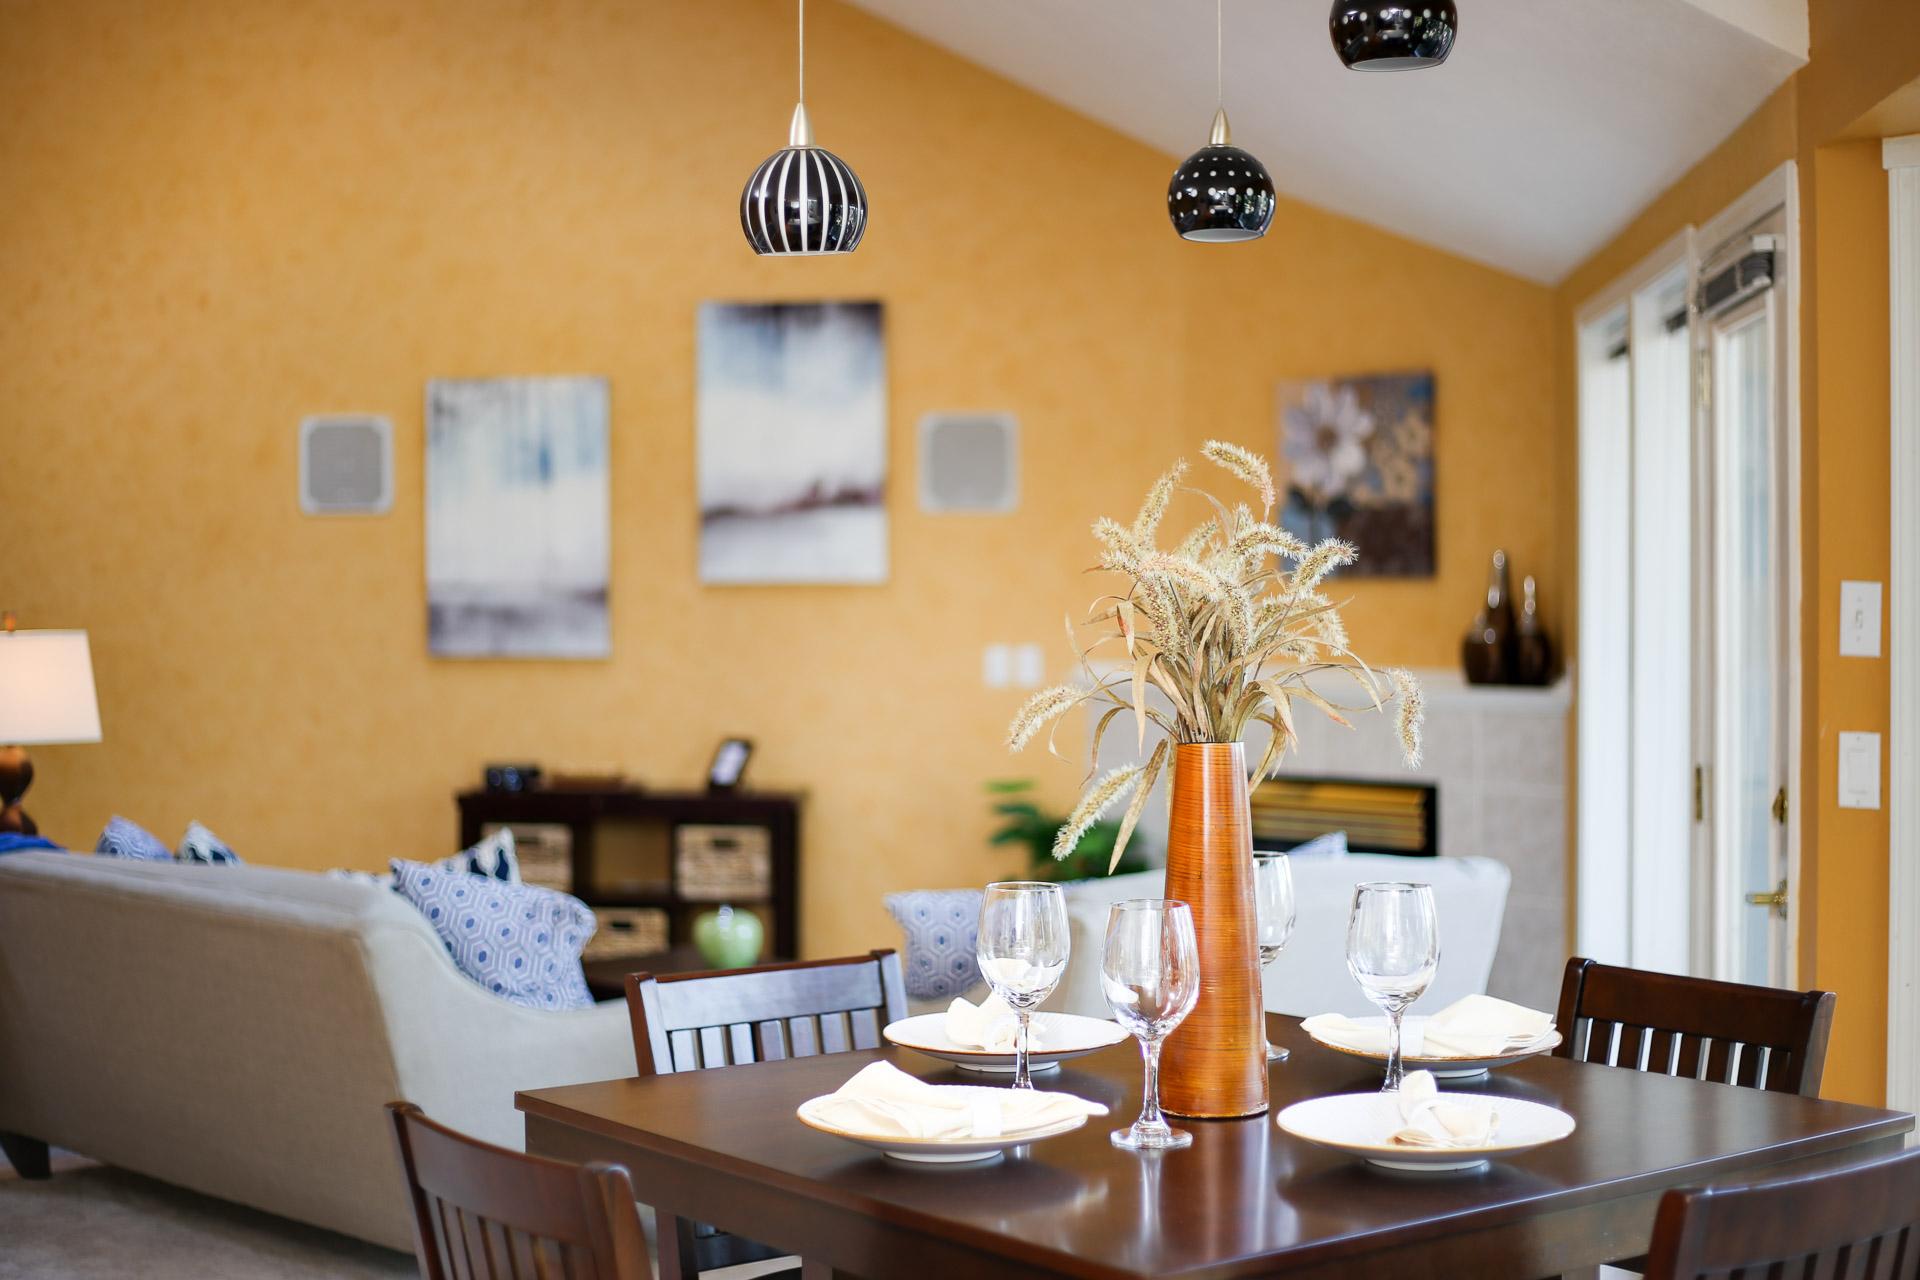 Spokane Interior Design Photography